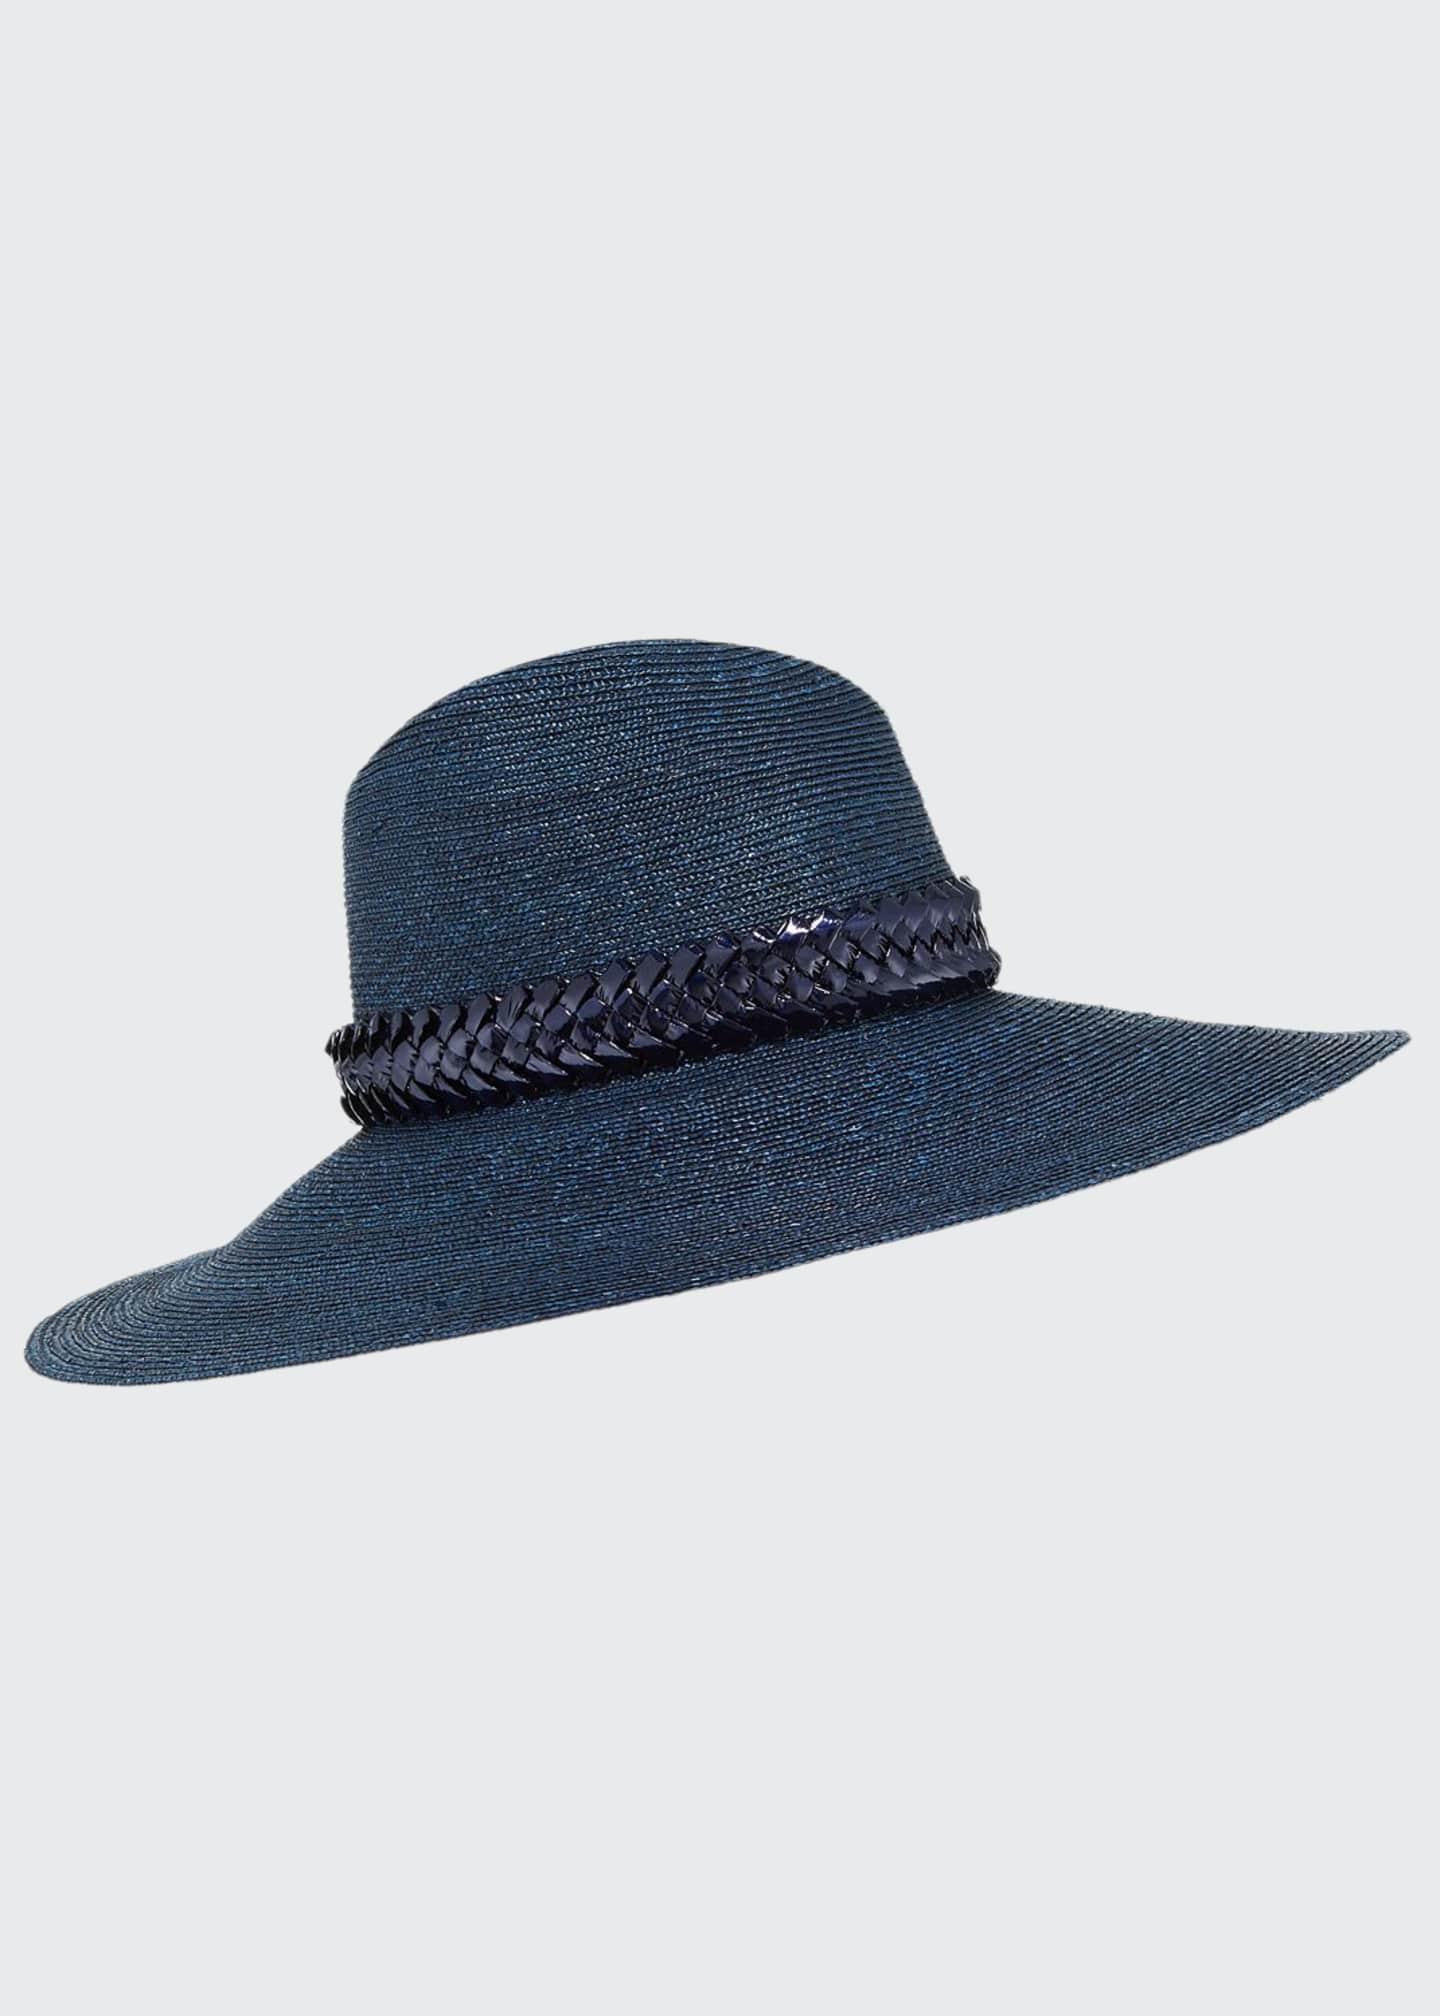 Gigi Burris Jeanne Hand-Blocked Straw Panama Hat